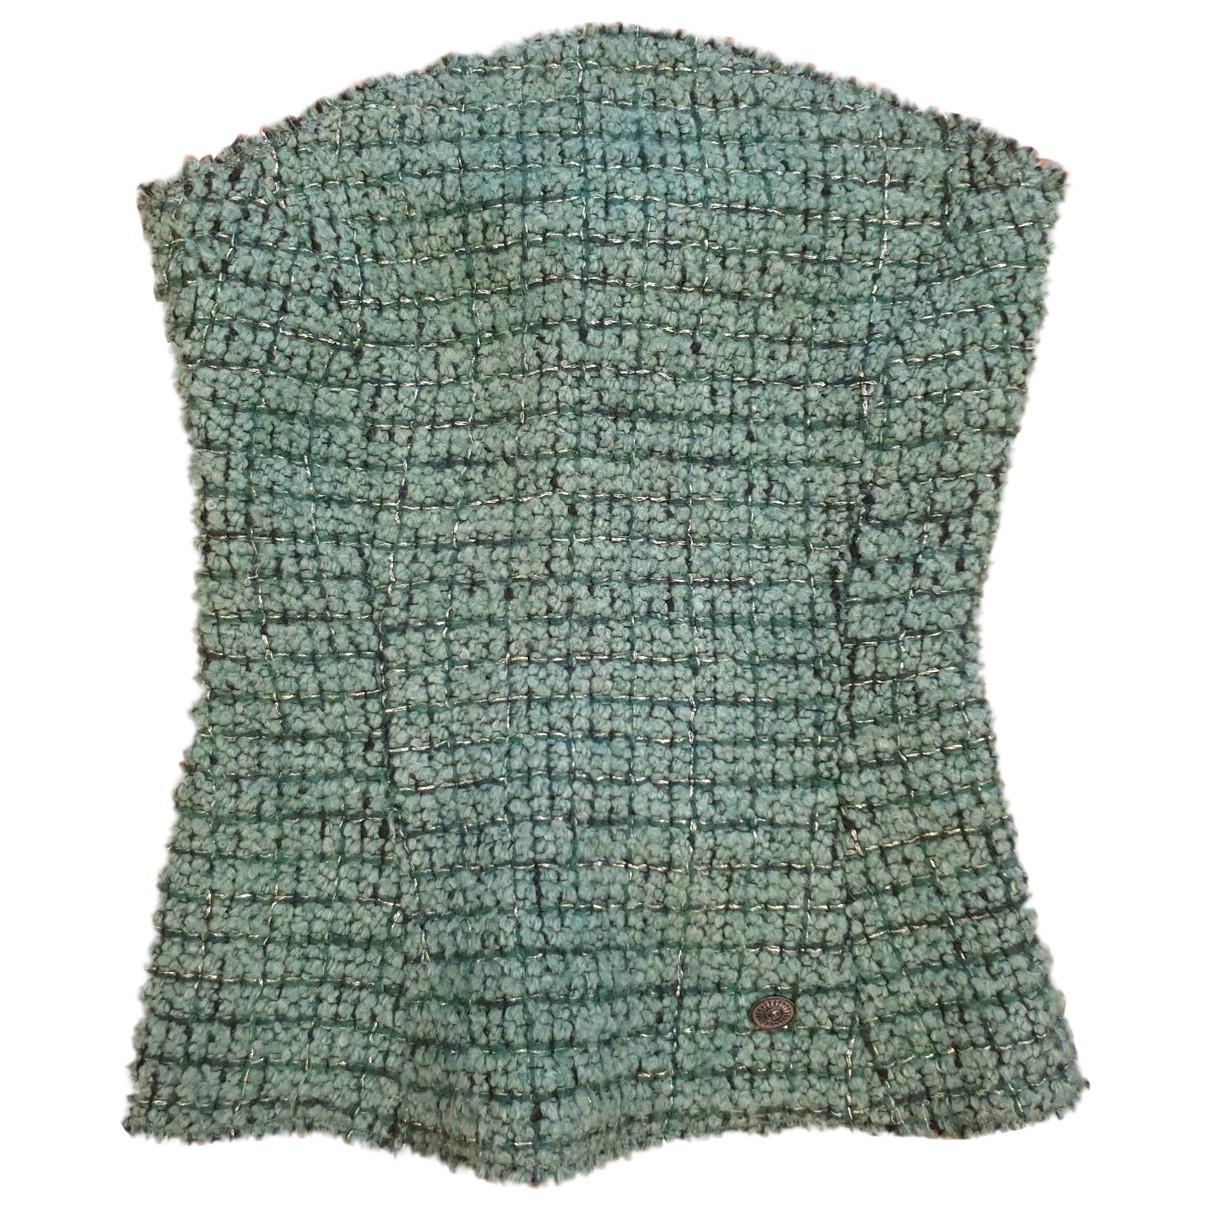 Chanel \N Green Tweed  top for Women 38 FR